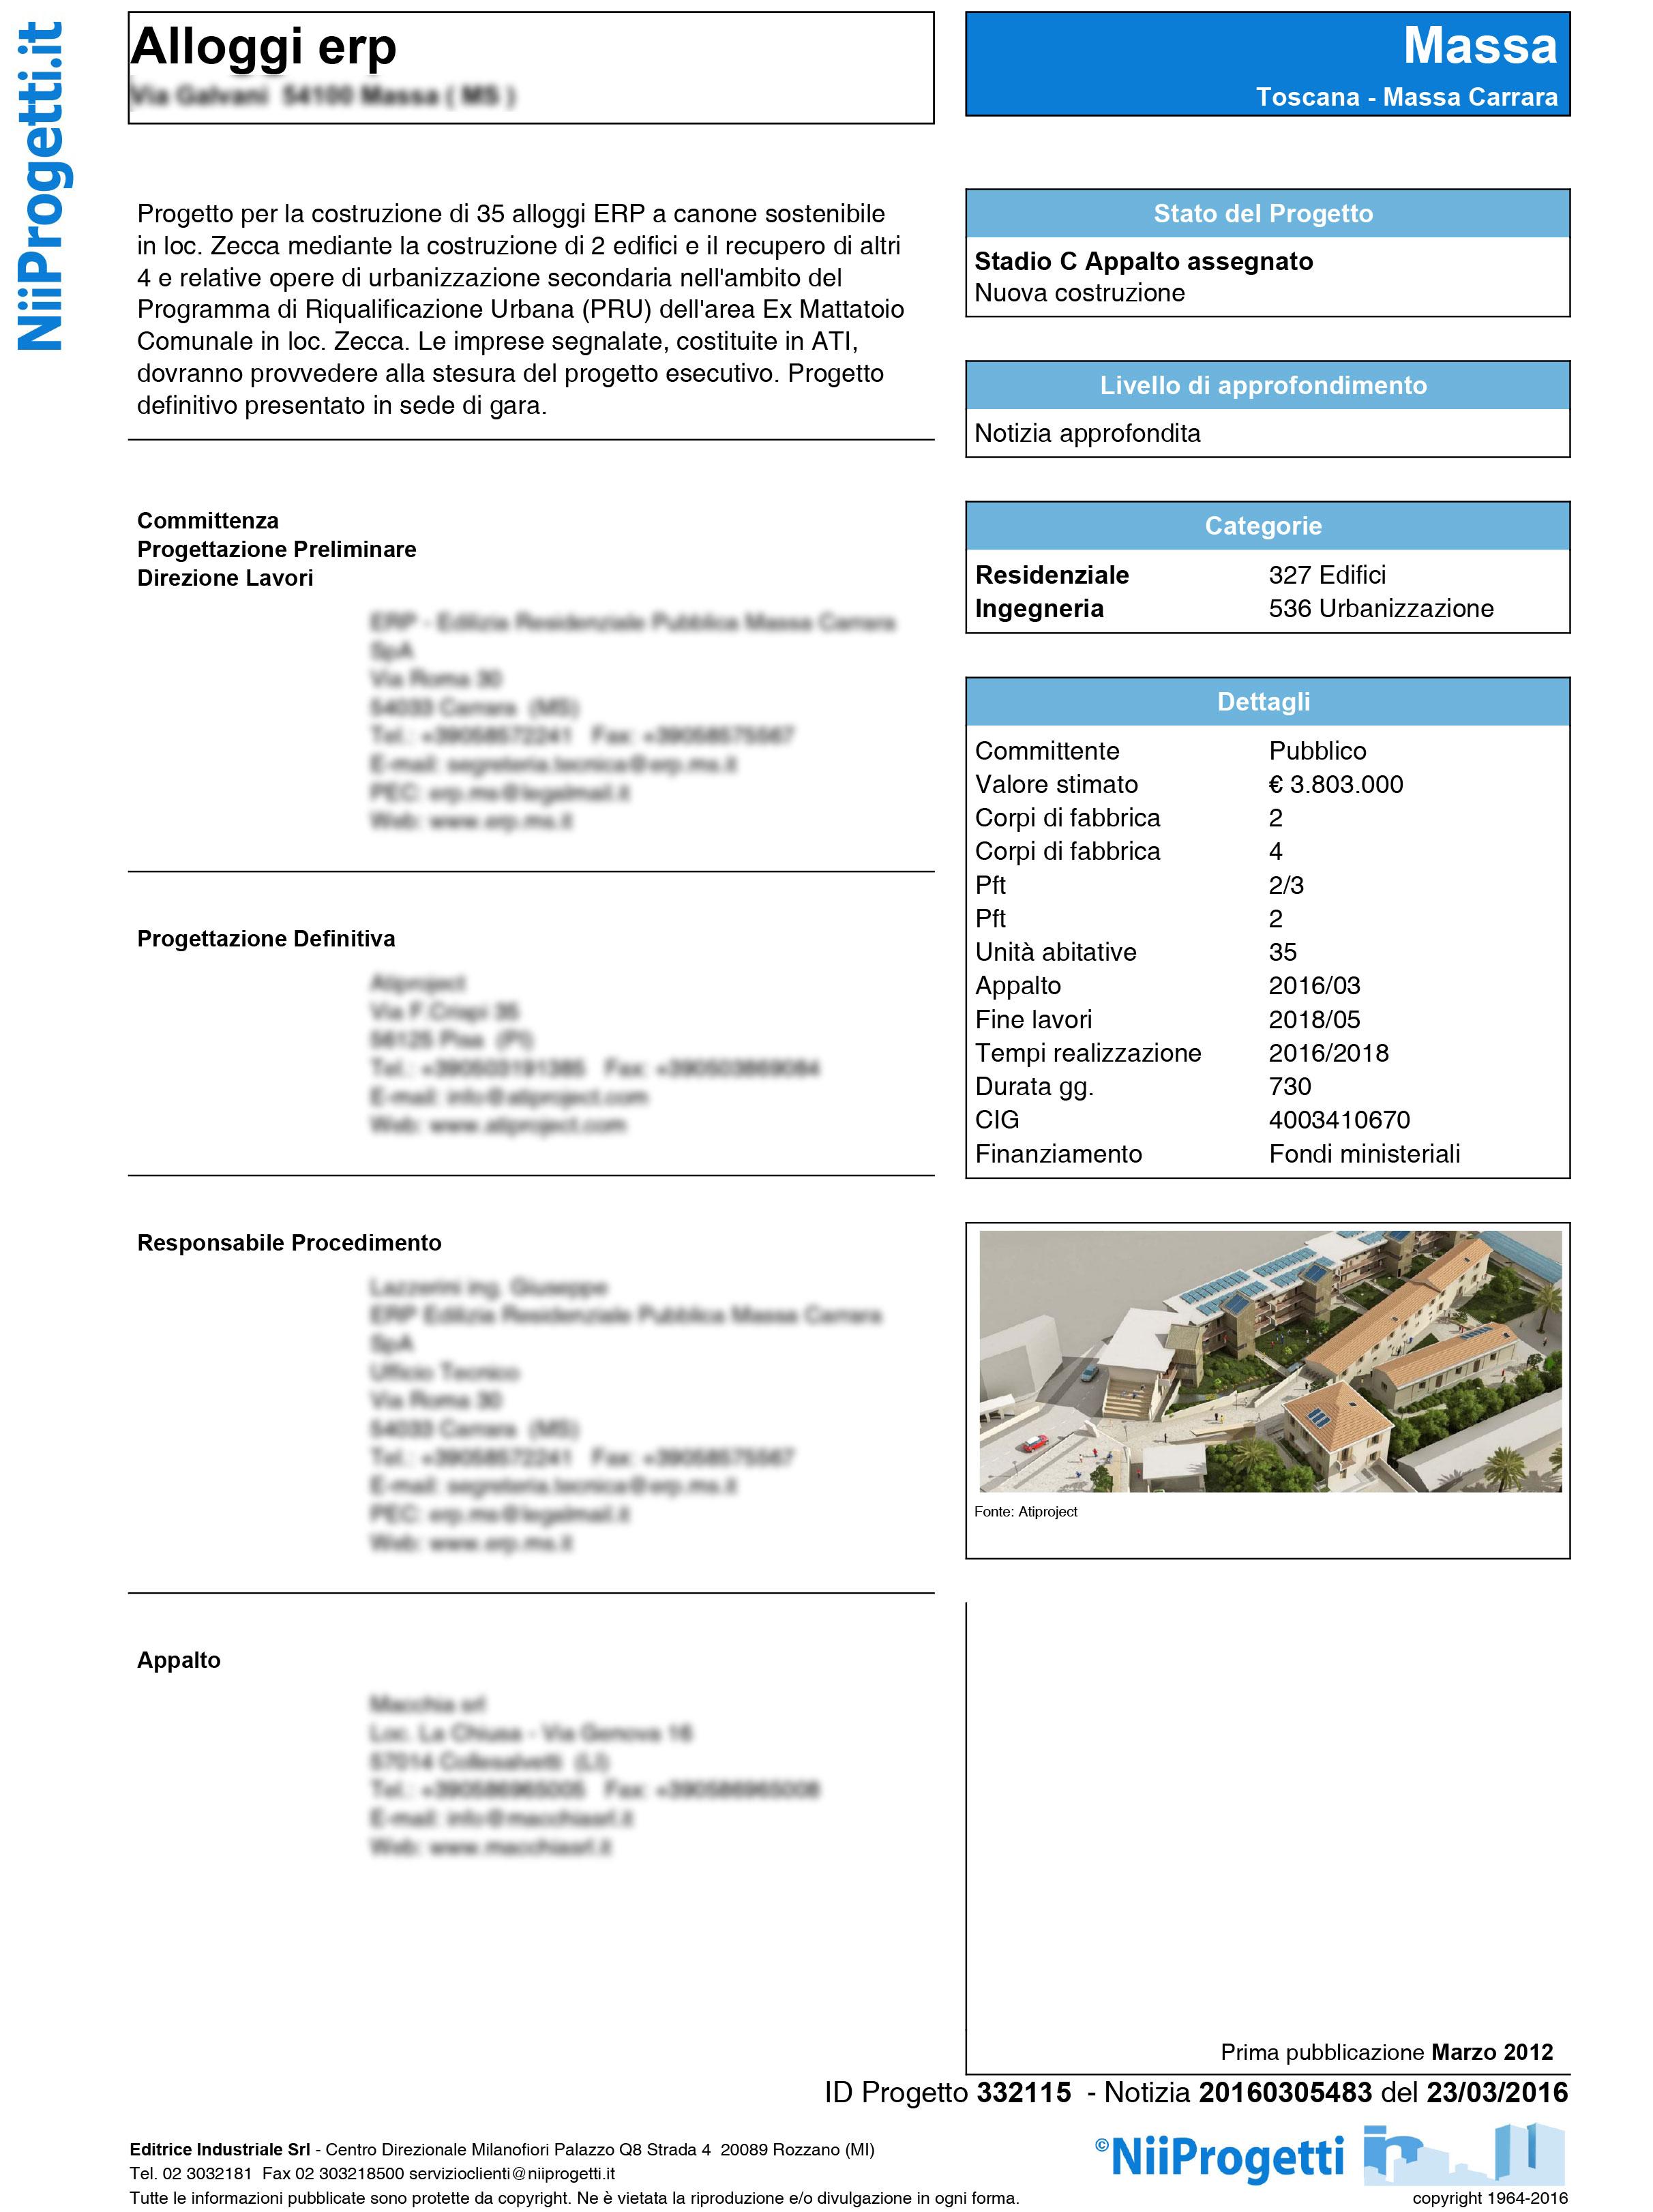 alloggi ERP Massa Carrara